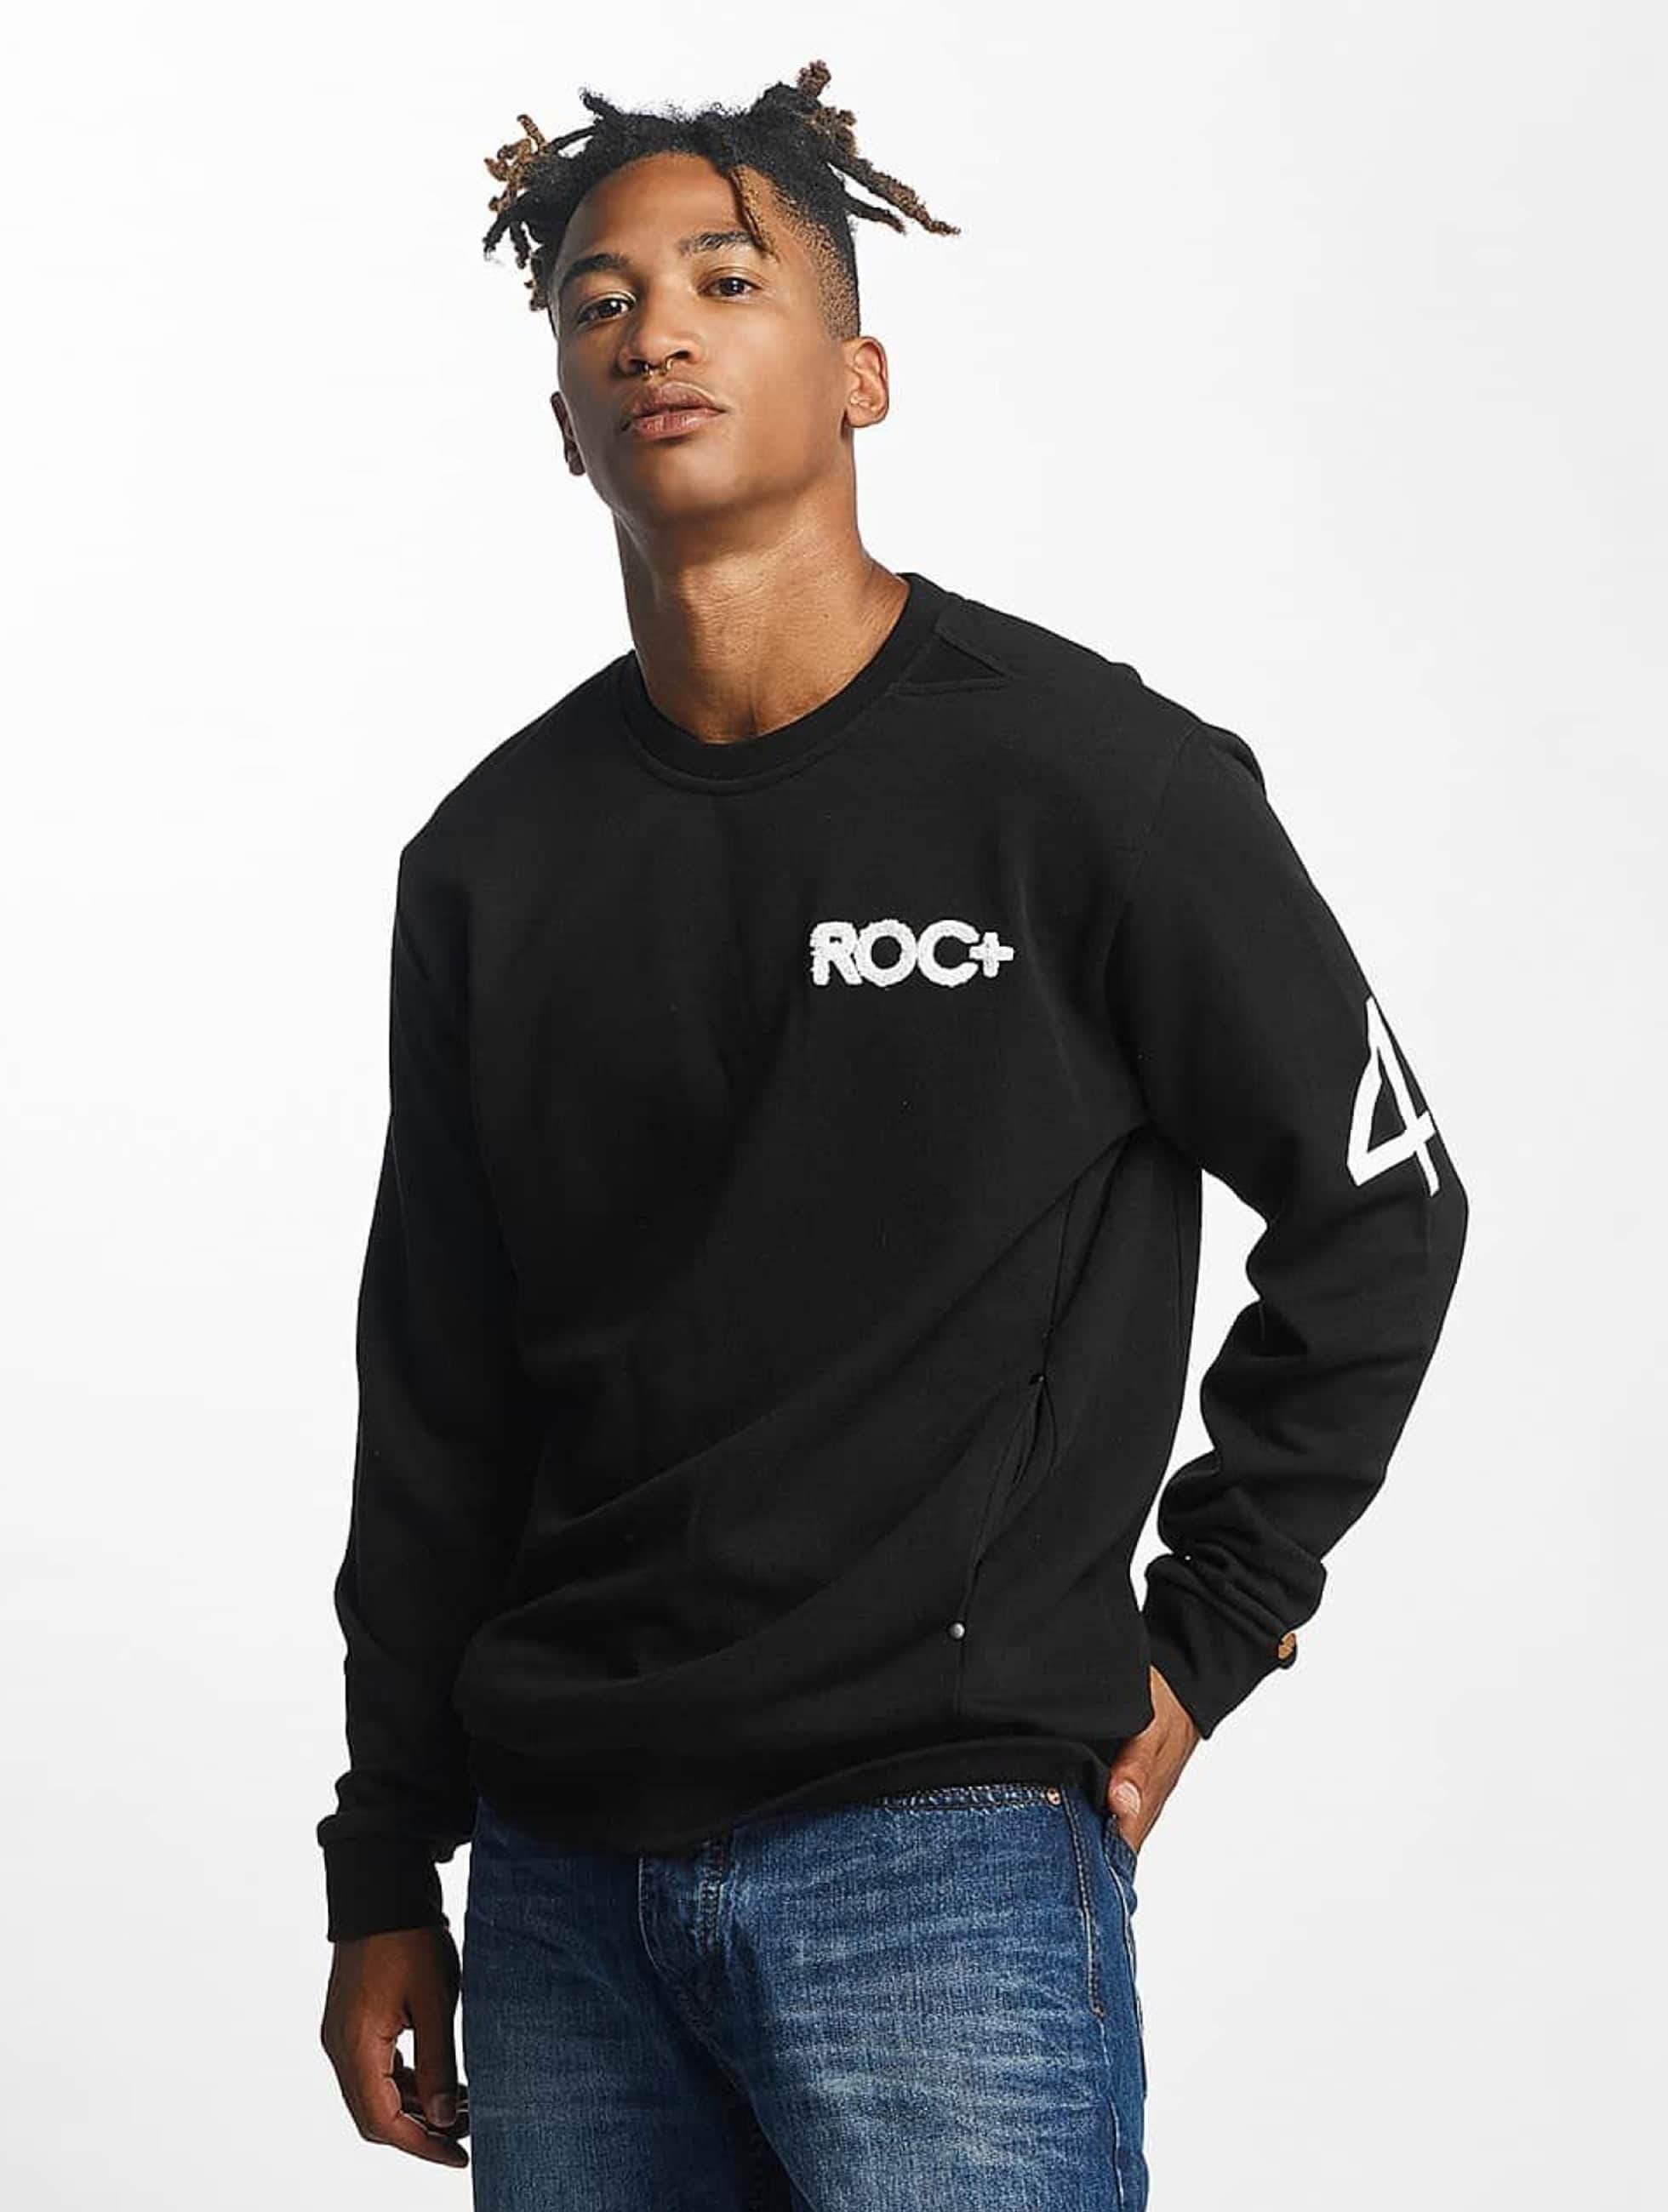 Rocawear / Jumper Retro Sport Crew Neck in black S